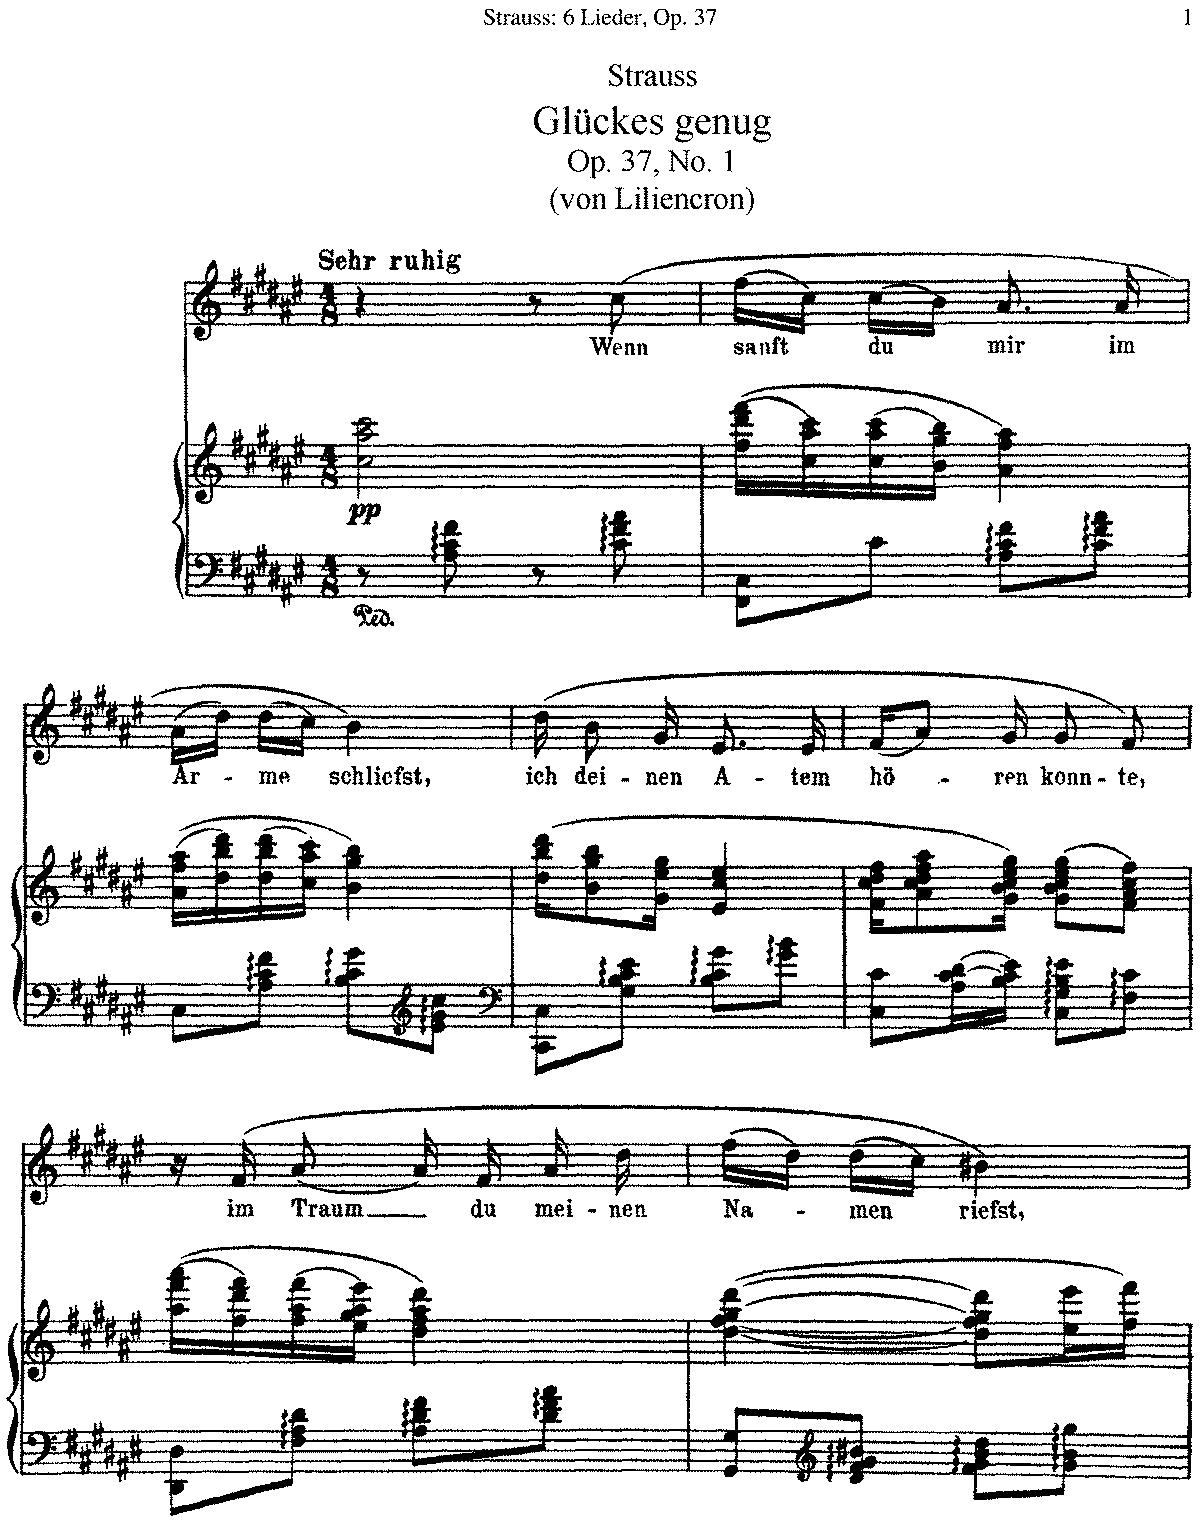 elements of music straus pdf